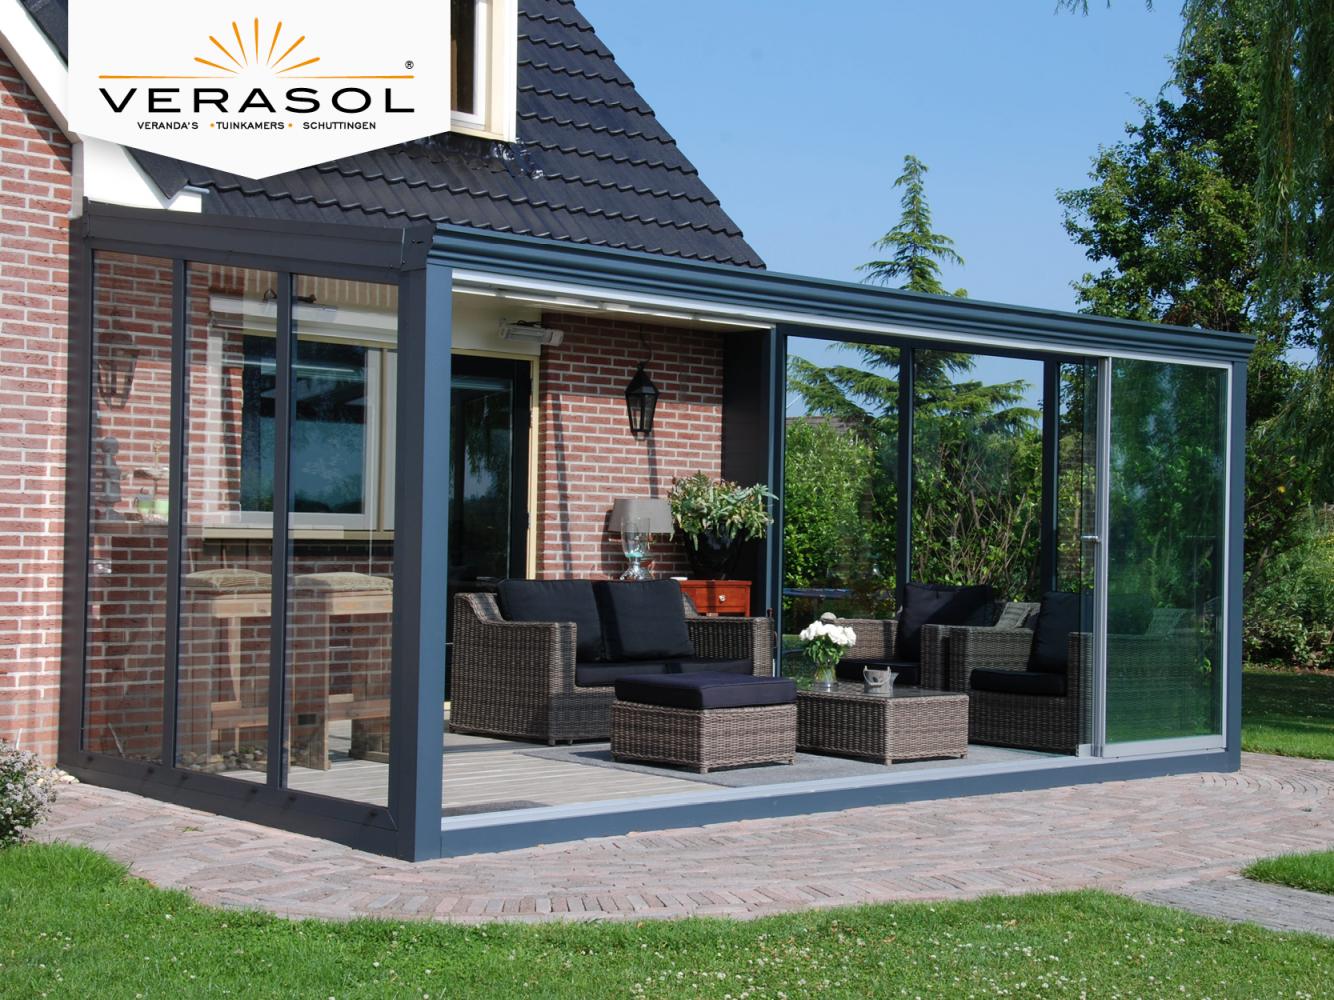 Tuinkamer en verandadak • Bastasol Zonwering & Outdoor Living